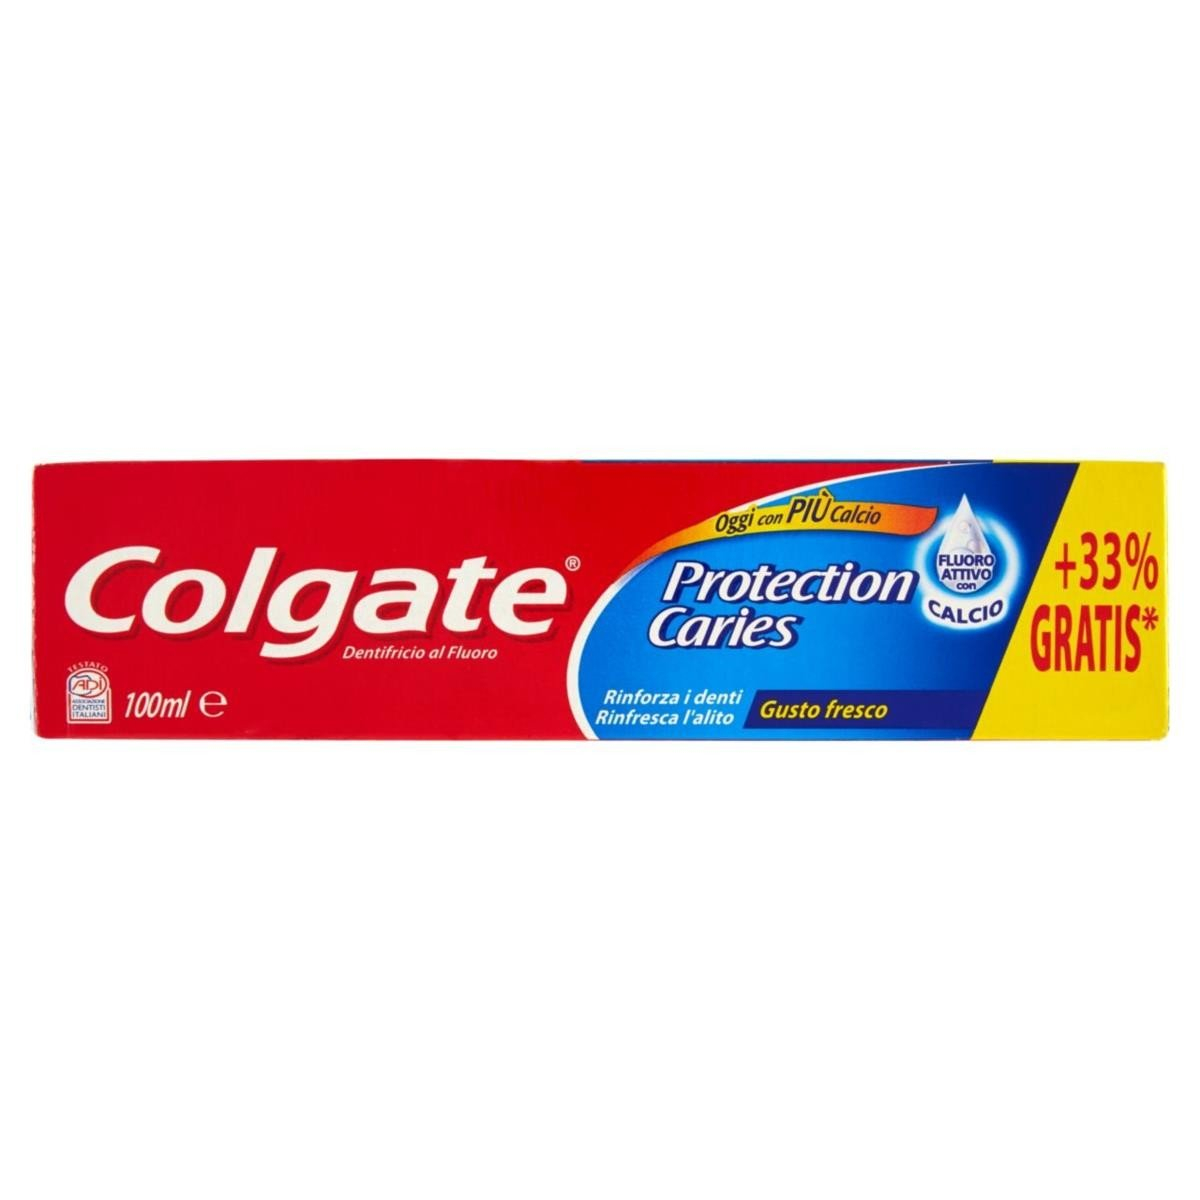 COLGATE Protection Caries Dentifricio 100ml